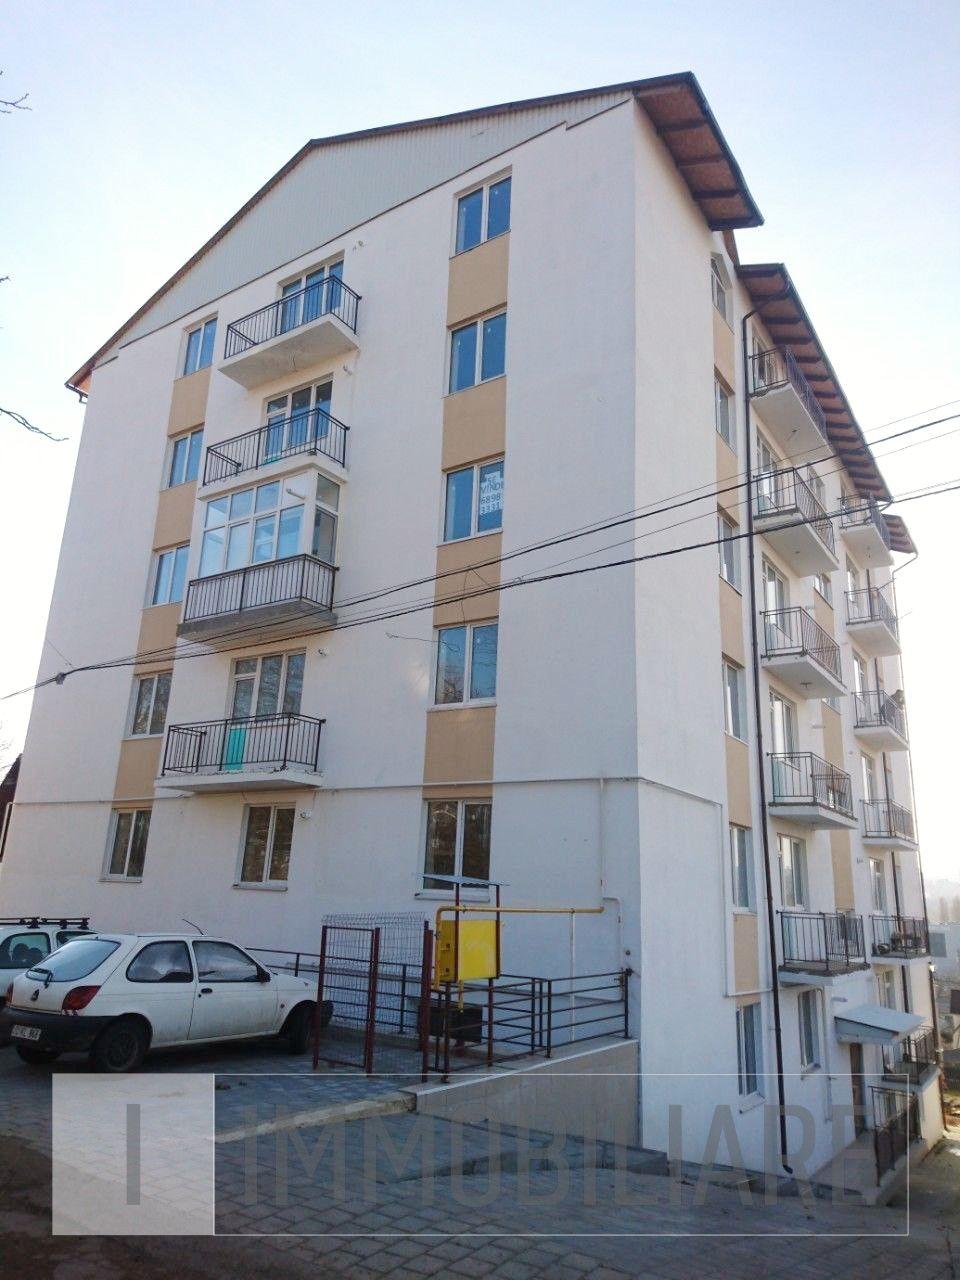 Apartament cu 2 camere+living, sect. Ciocana, str. Liviu Rebreanu.